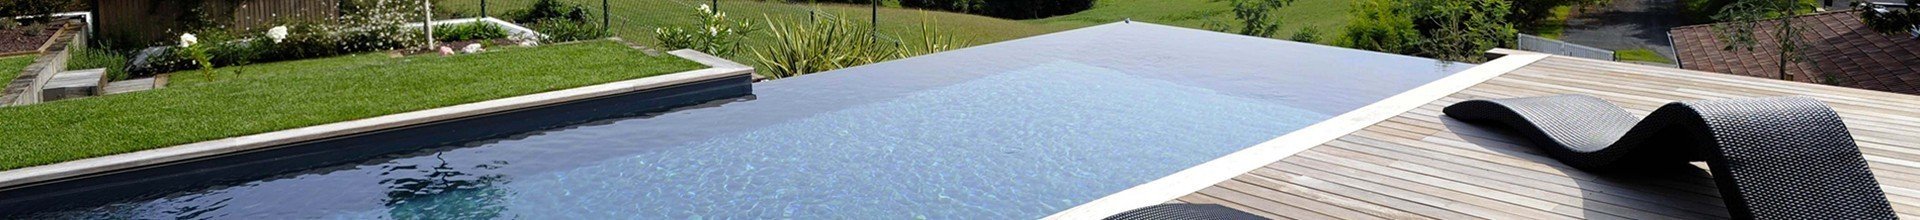 Direct usine, piscine coque prix Ardennes